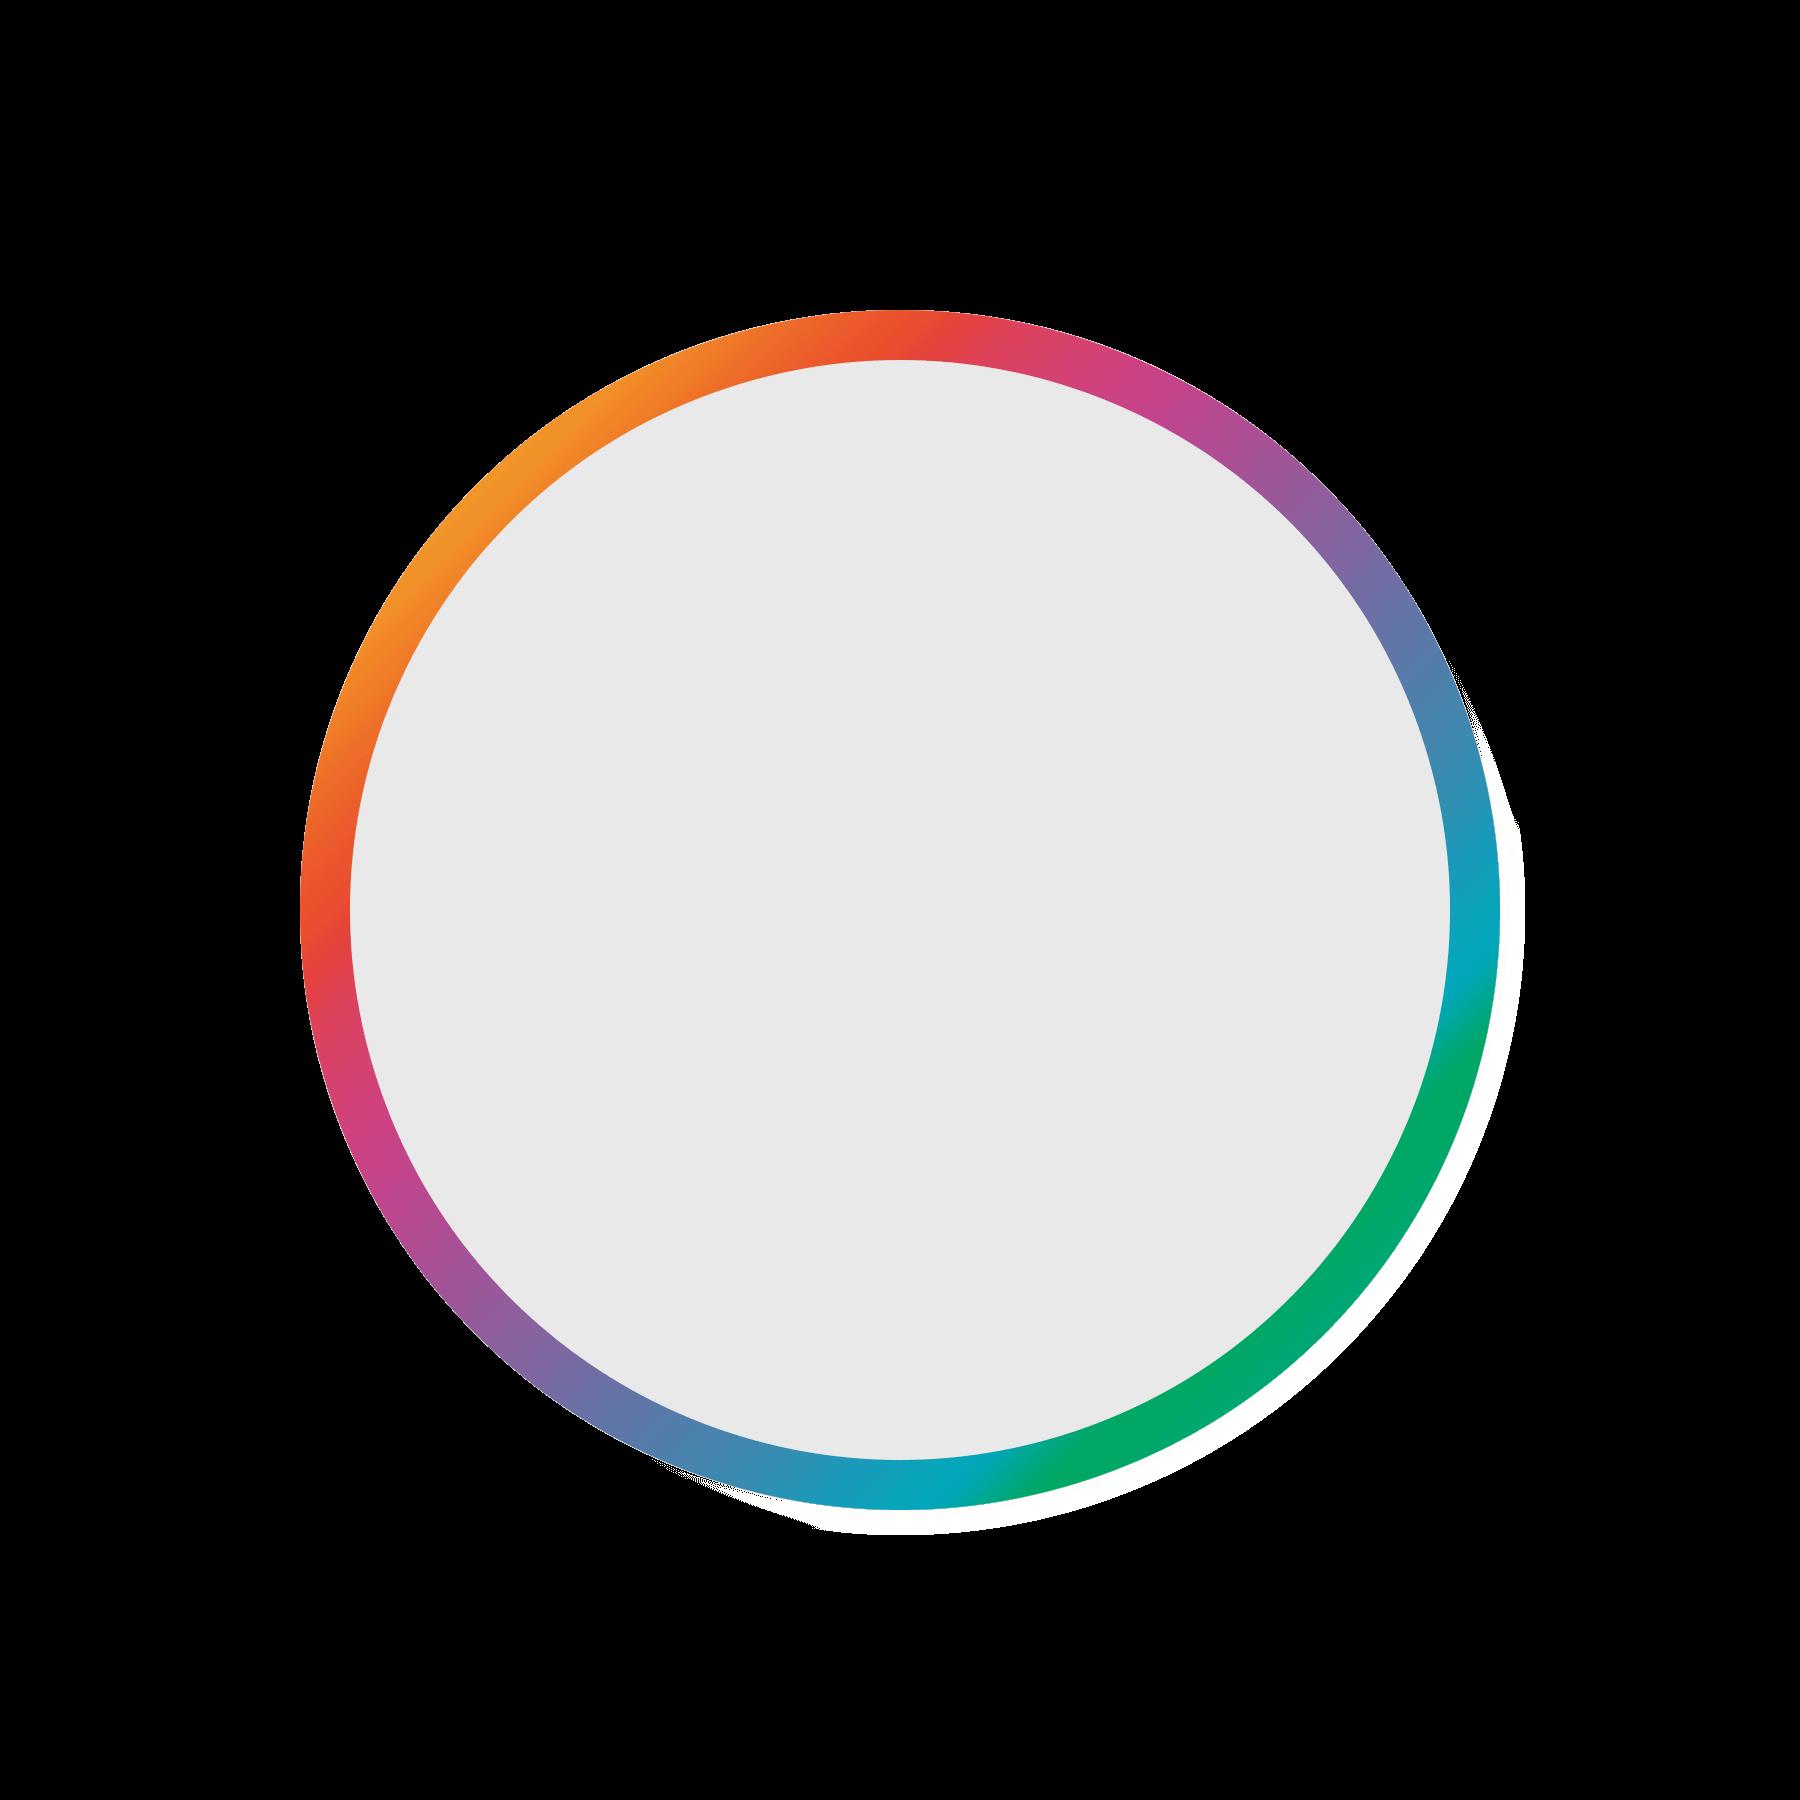 XMG SECTOR X White - Intel